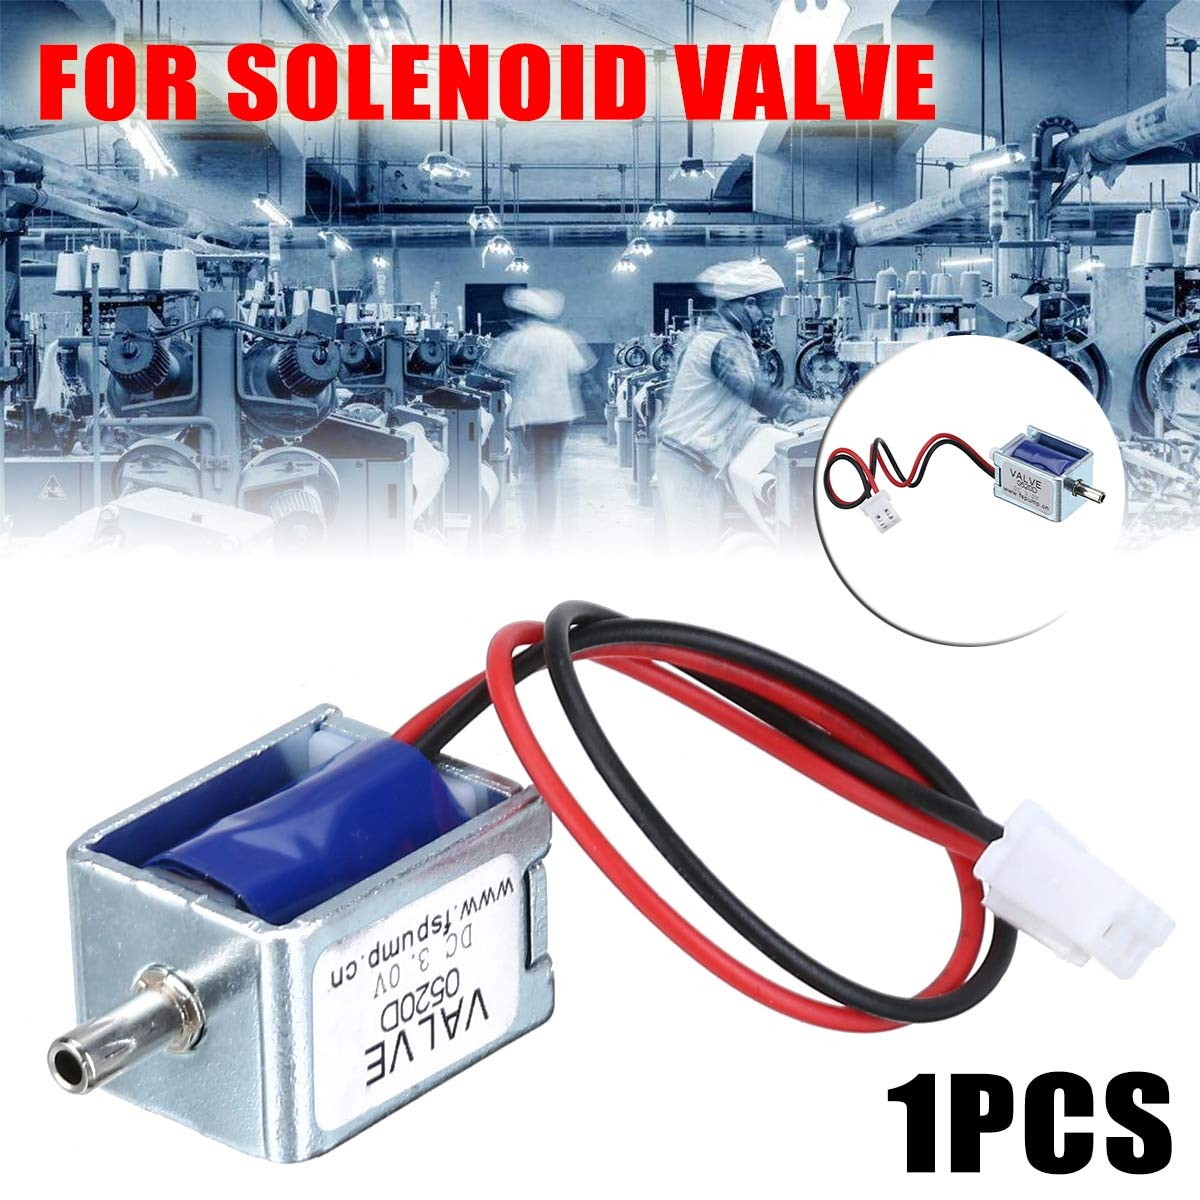 1Pcs DC 3V Mini Electric DC Solenoid Valve N//C Normally Closed for Gas Air Valve Solenoid Valve